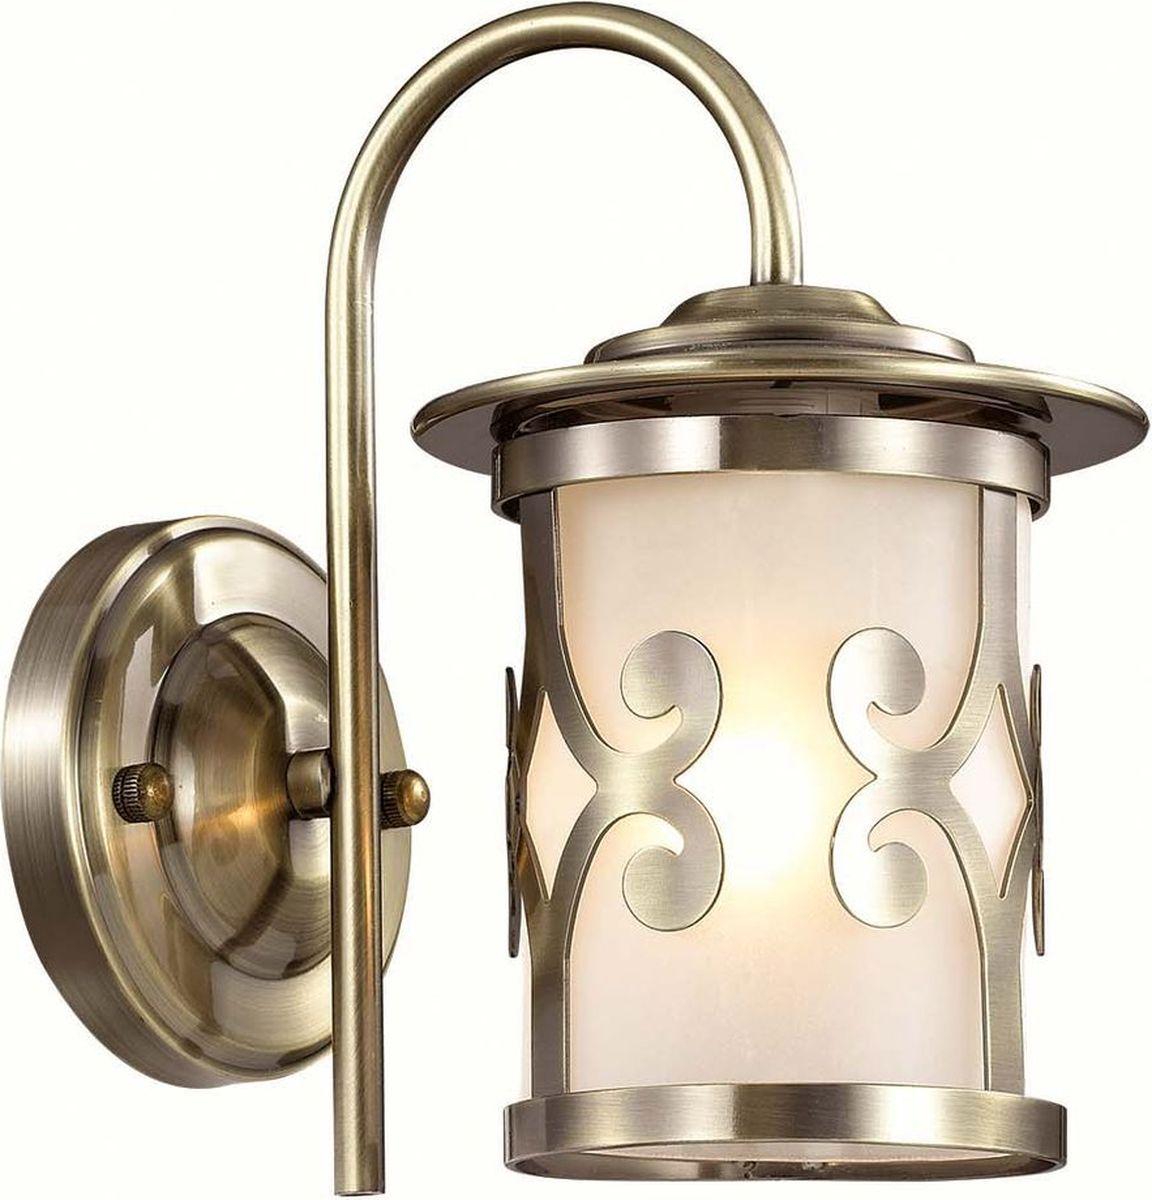 Бра Lumion Sekvana Bronze, цвет: белый, E27, 40 Вт. 3118/1W3118/1W